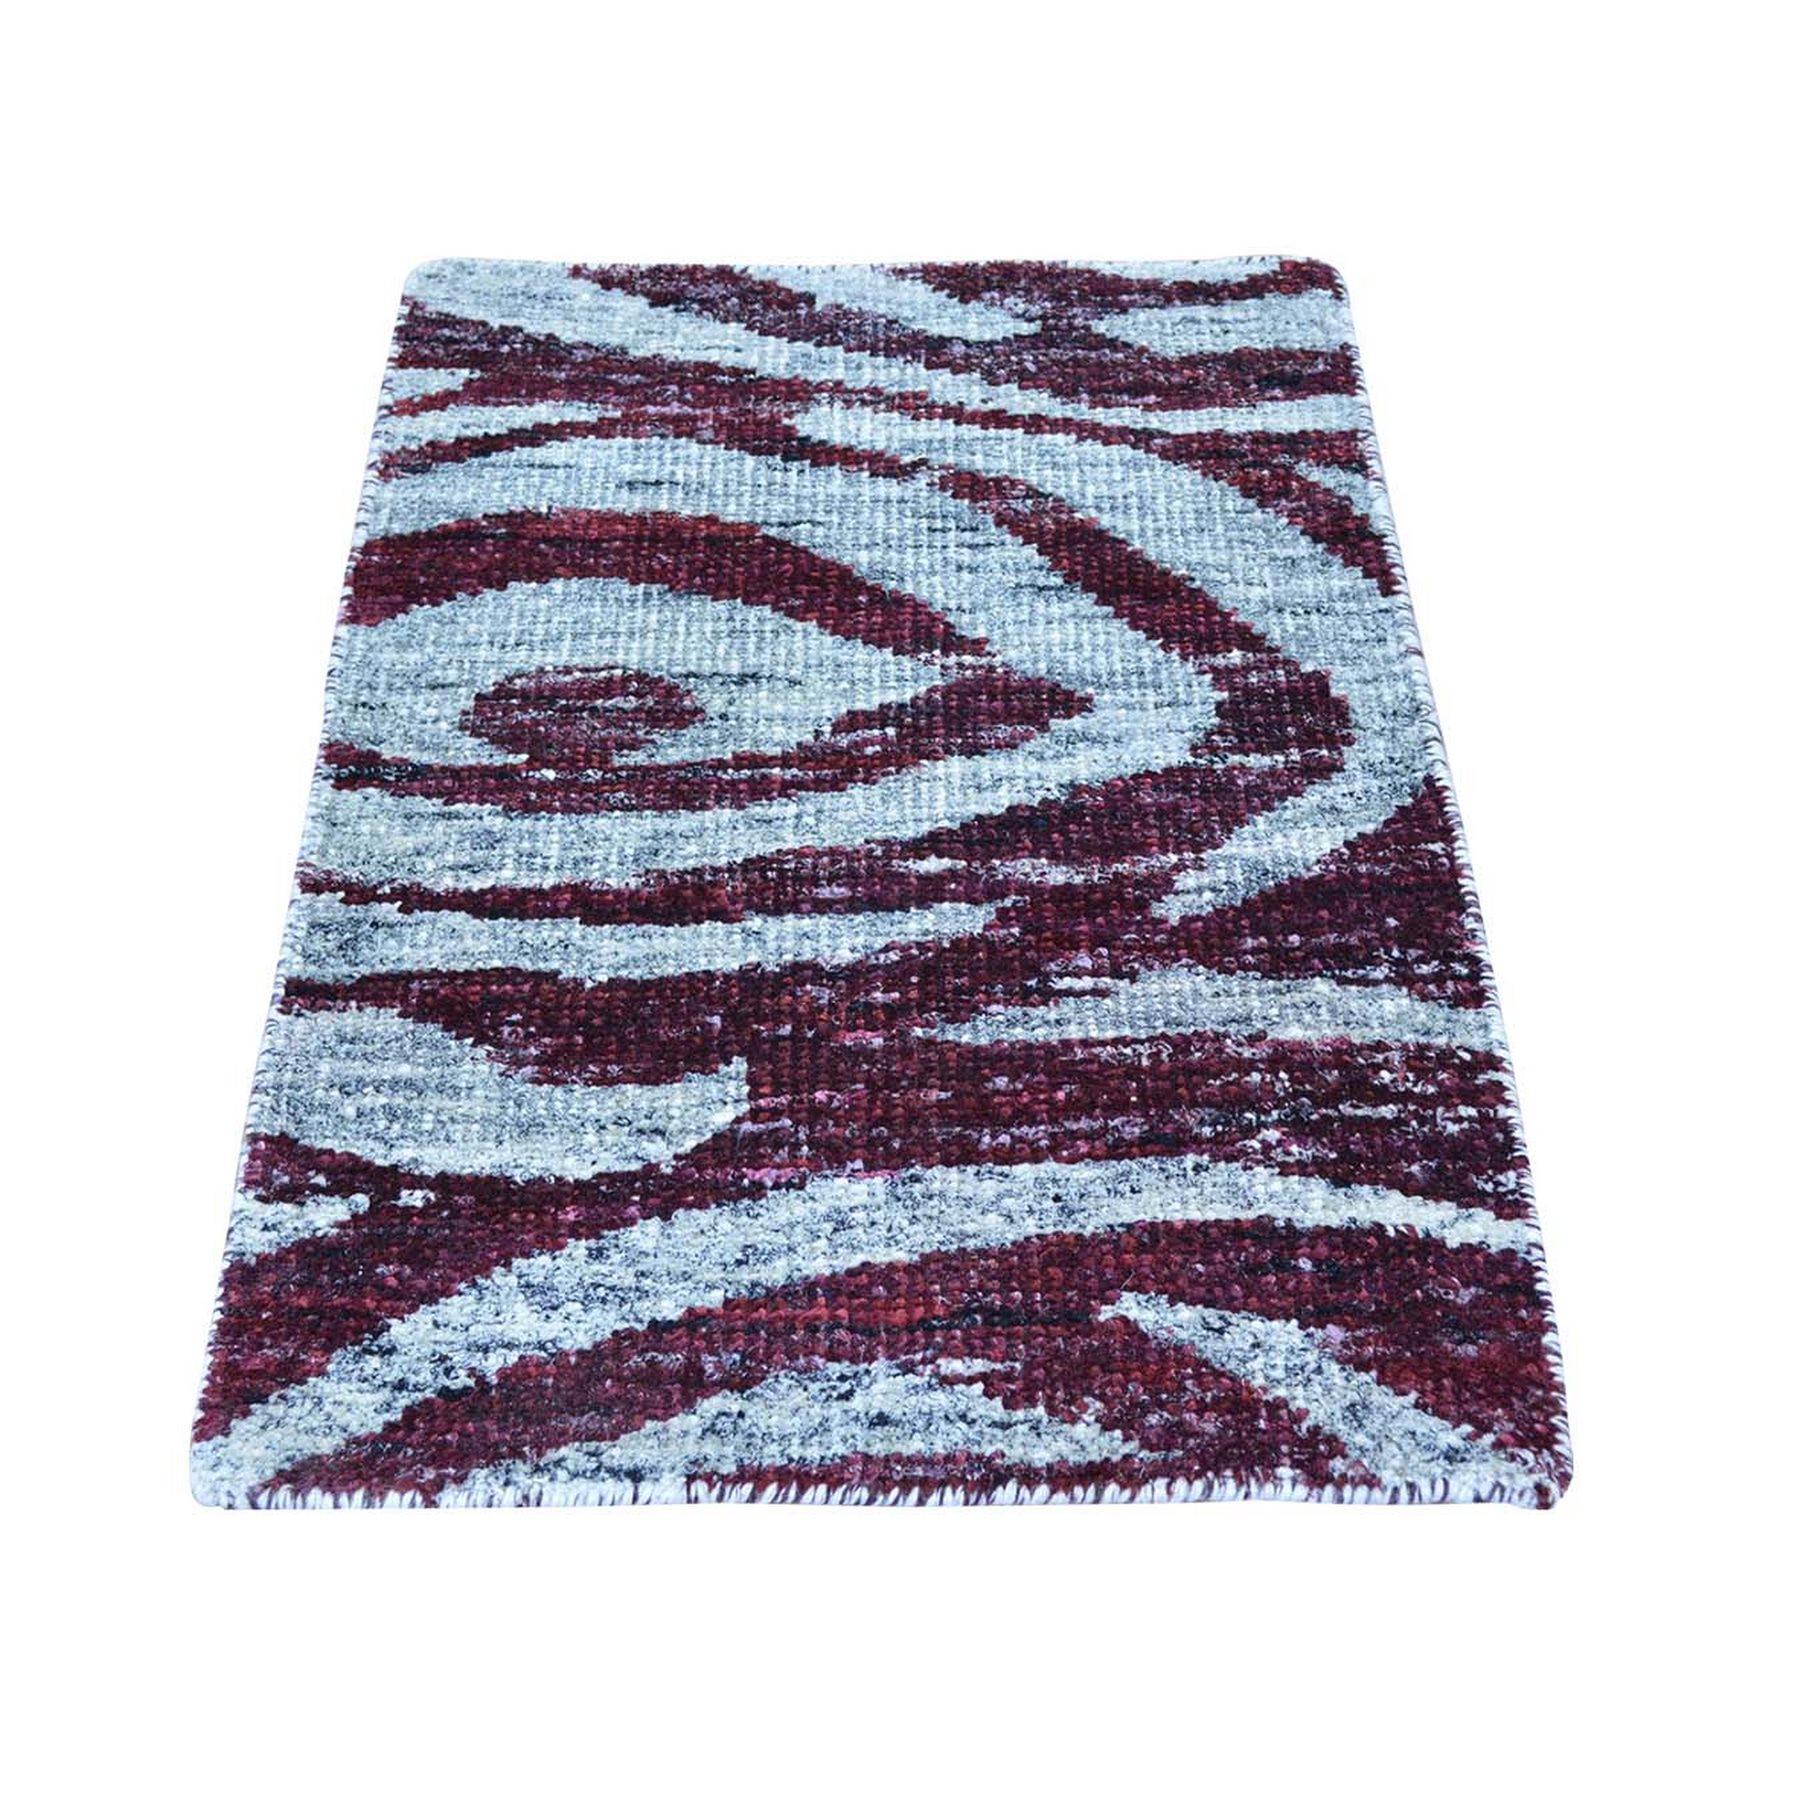 2'X3' Multicolored Modern Sari Silk Handmade Rug moab6a8d